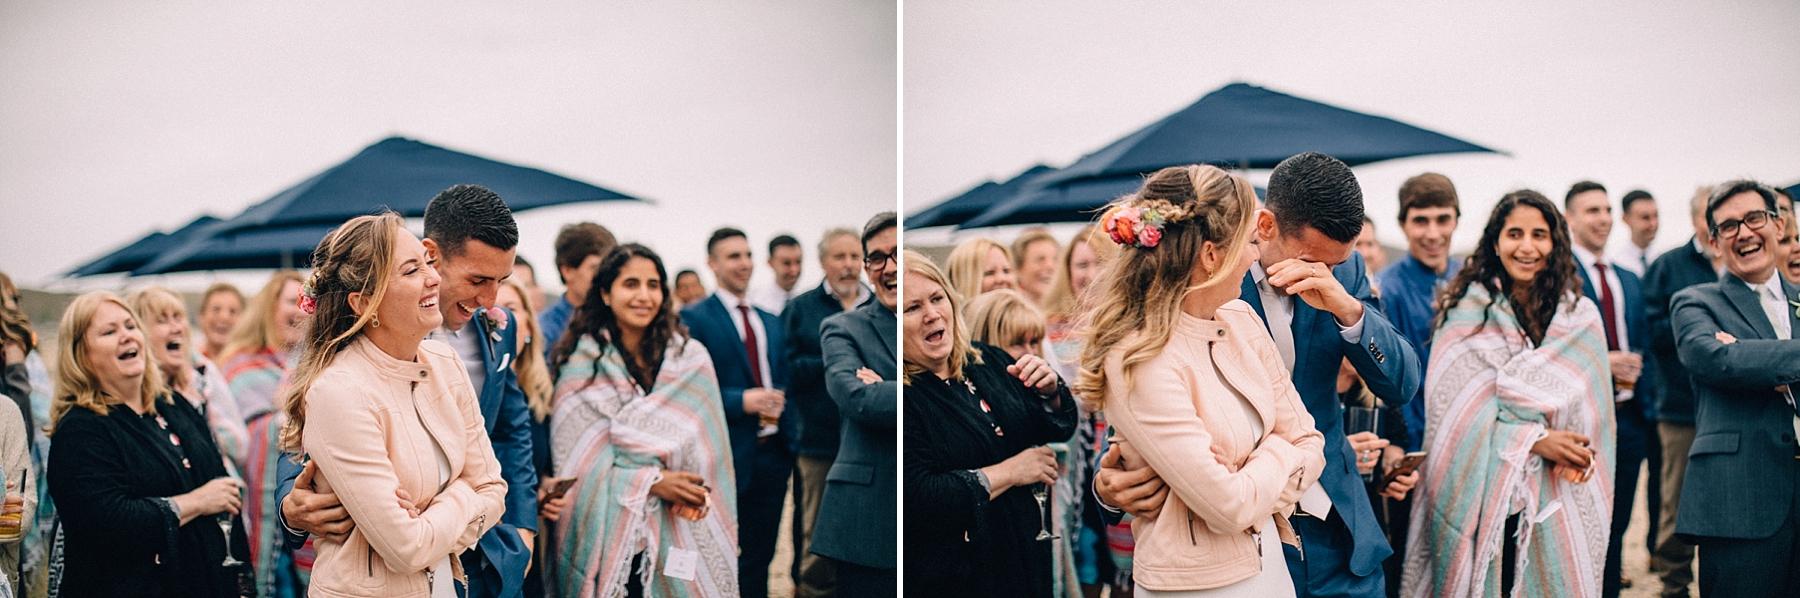 montauk-wedding-photography-rainy-navy-beach_0056.jpg